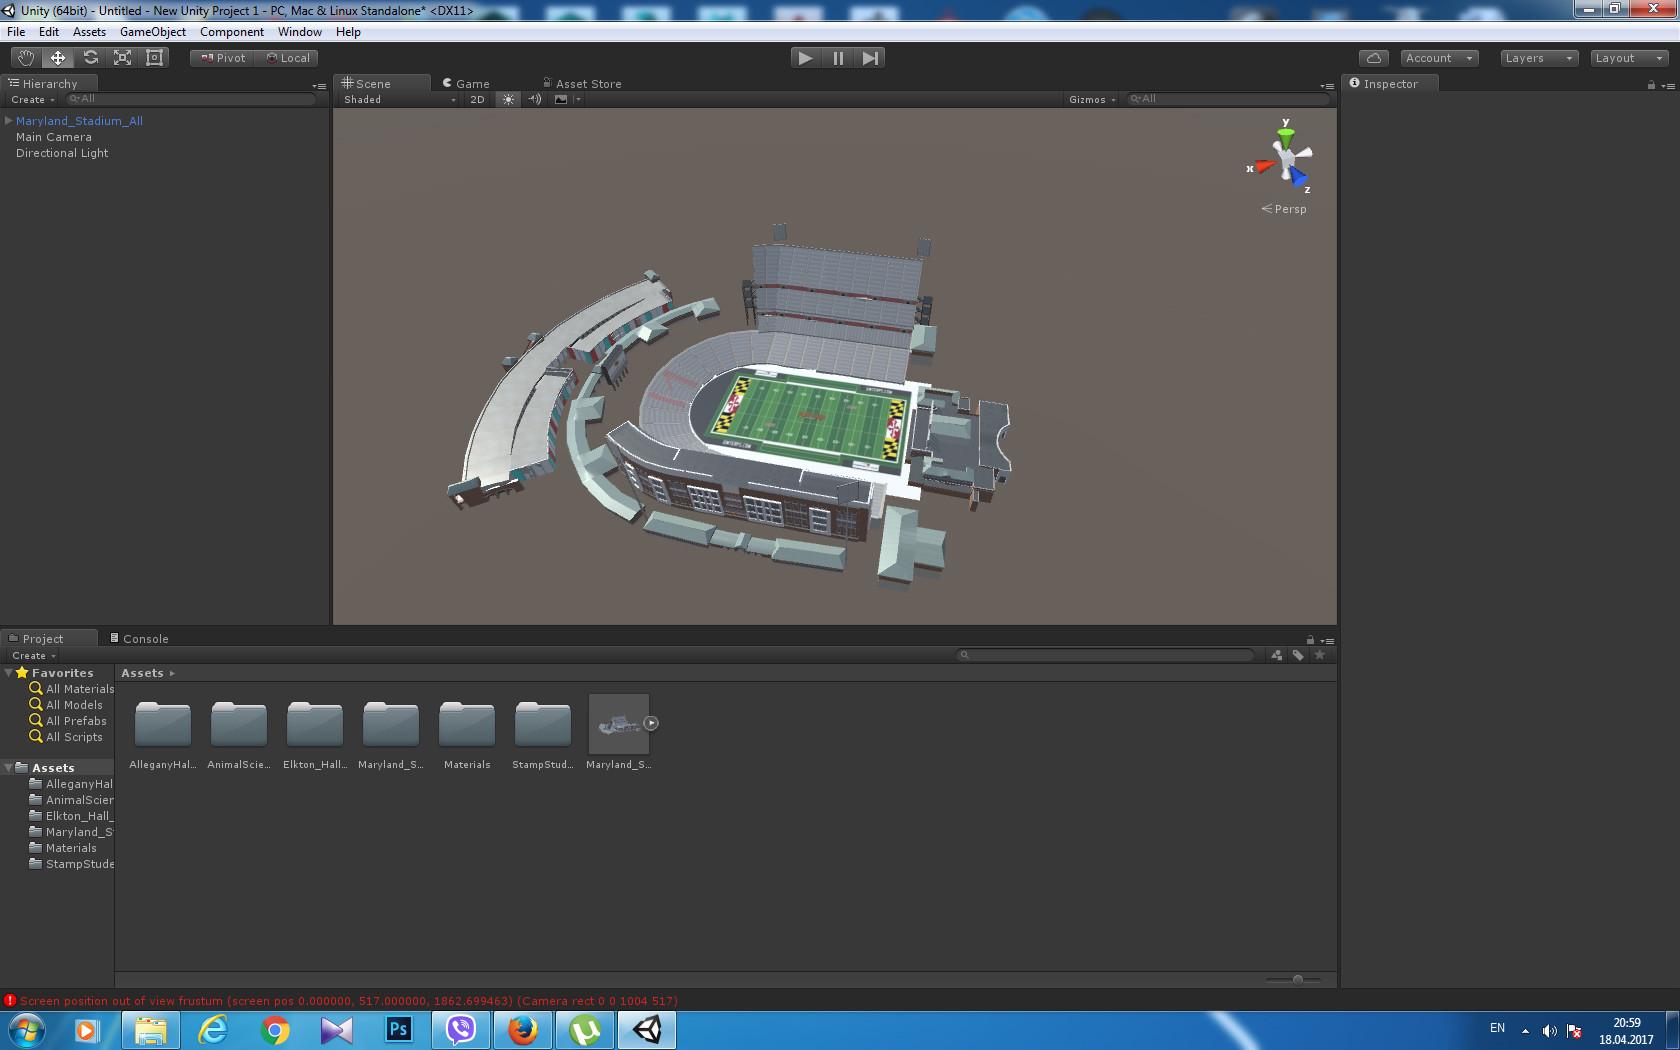 ArtStation - Maryland Stadium Building - model for Unity 3d